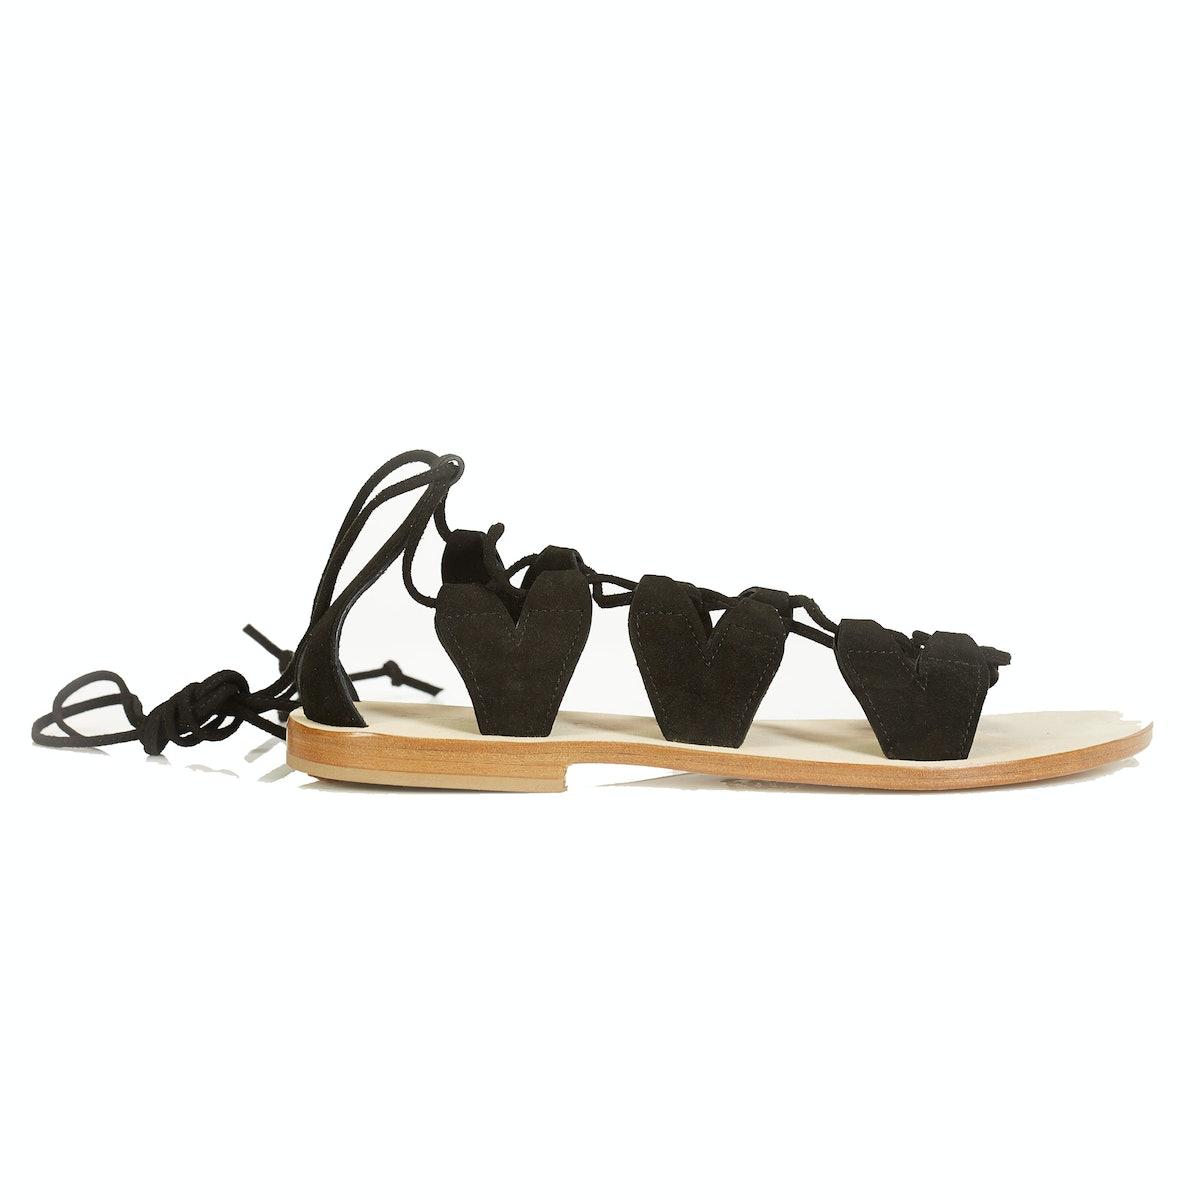 Cornetti sandal